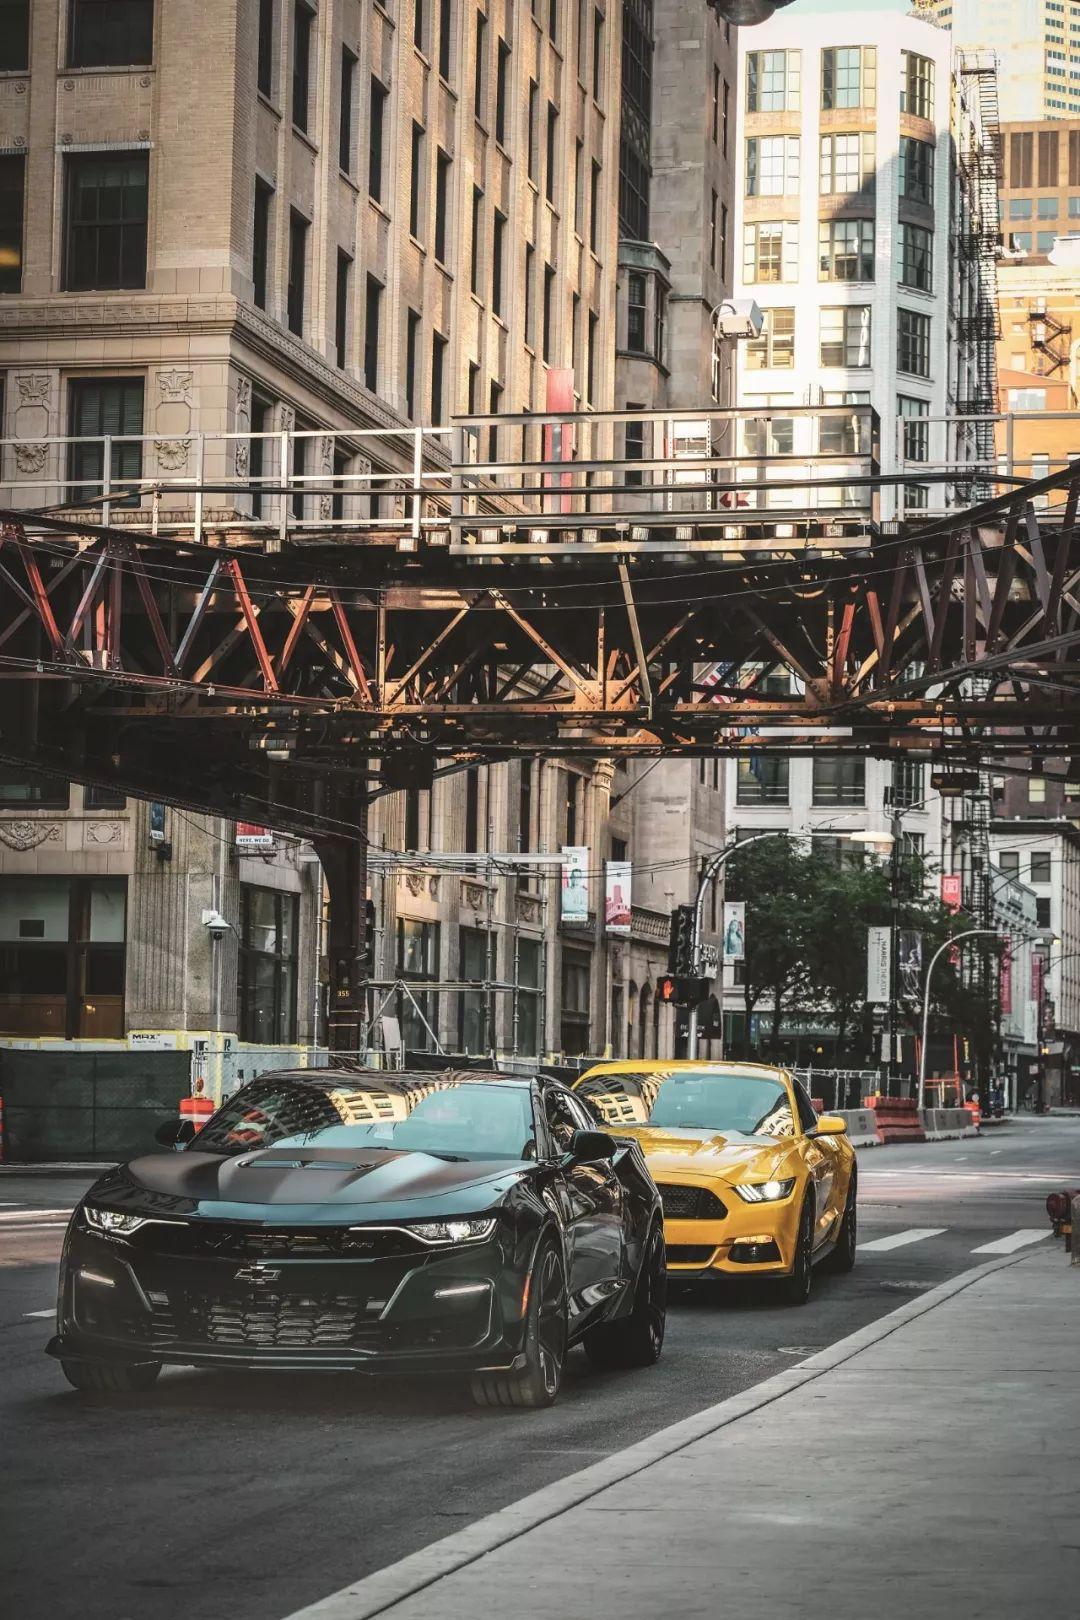 恶棍——福特Mustang & 雪佛兰Camaro